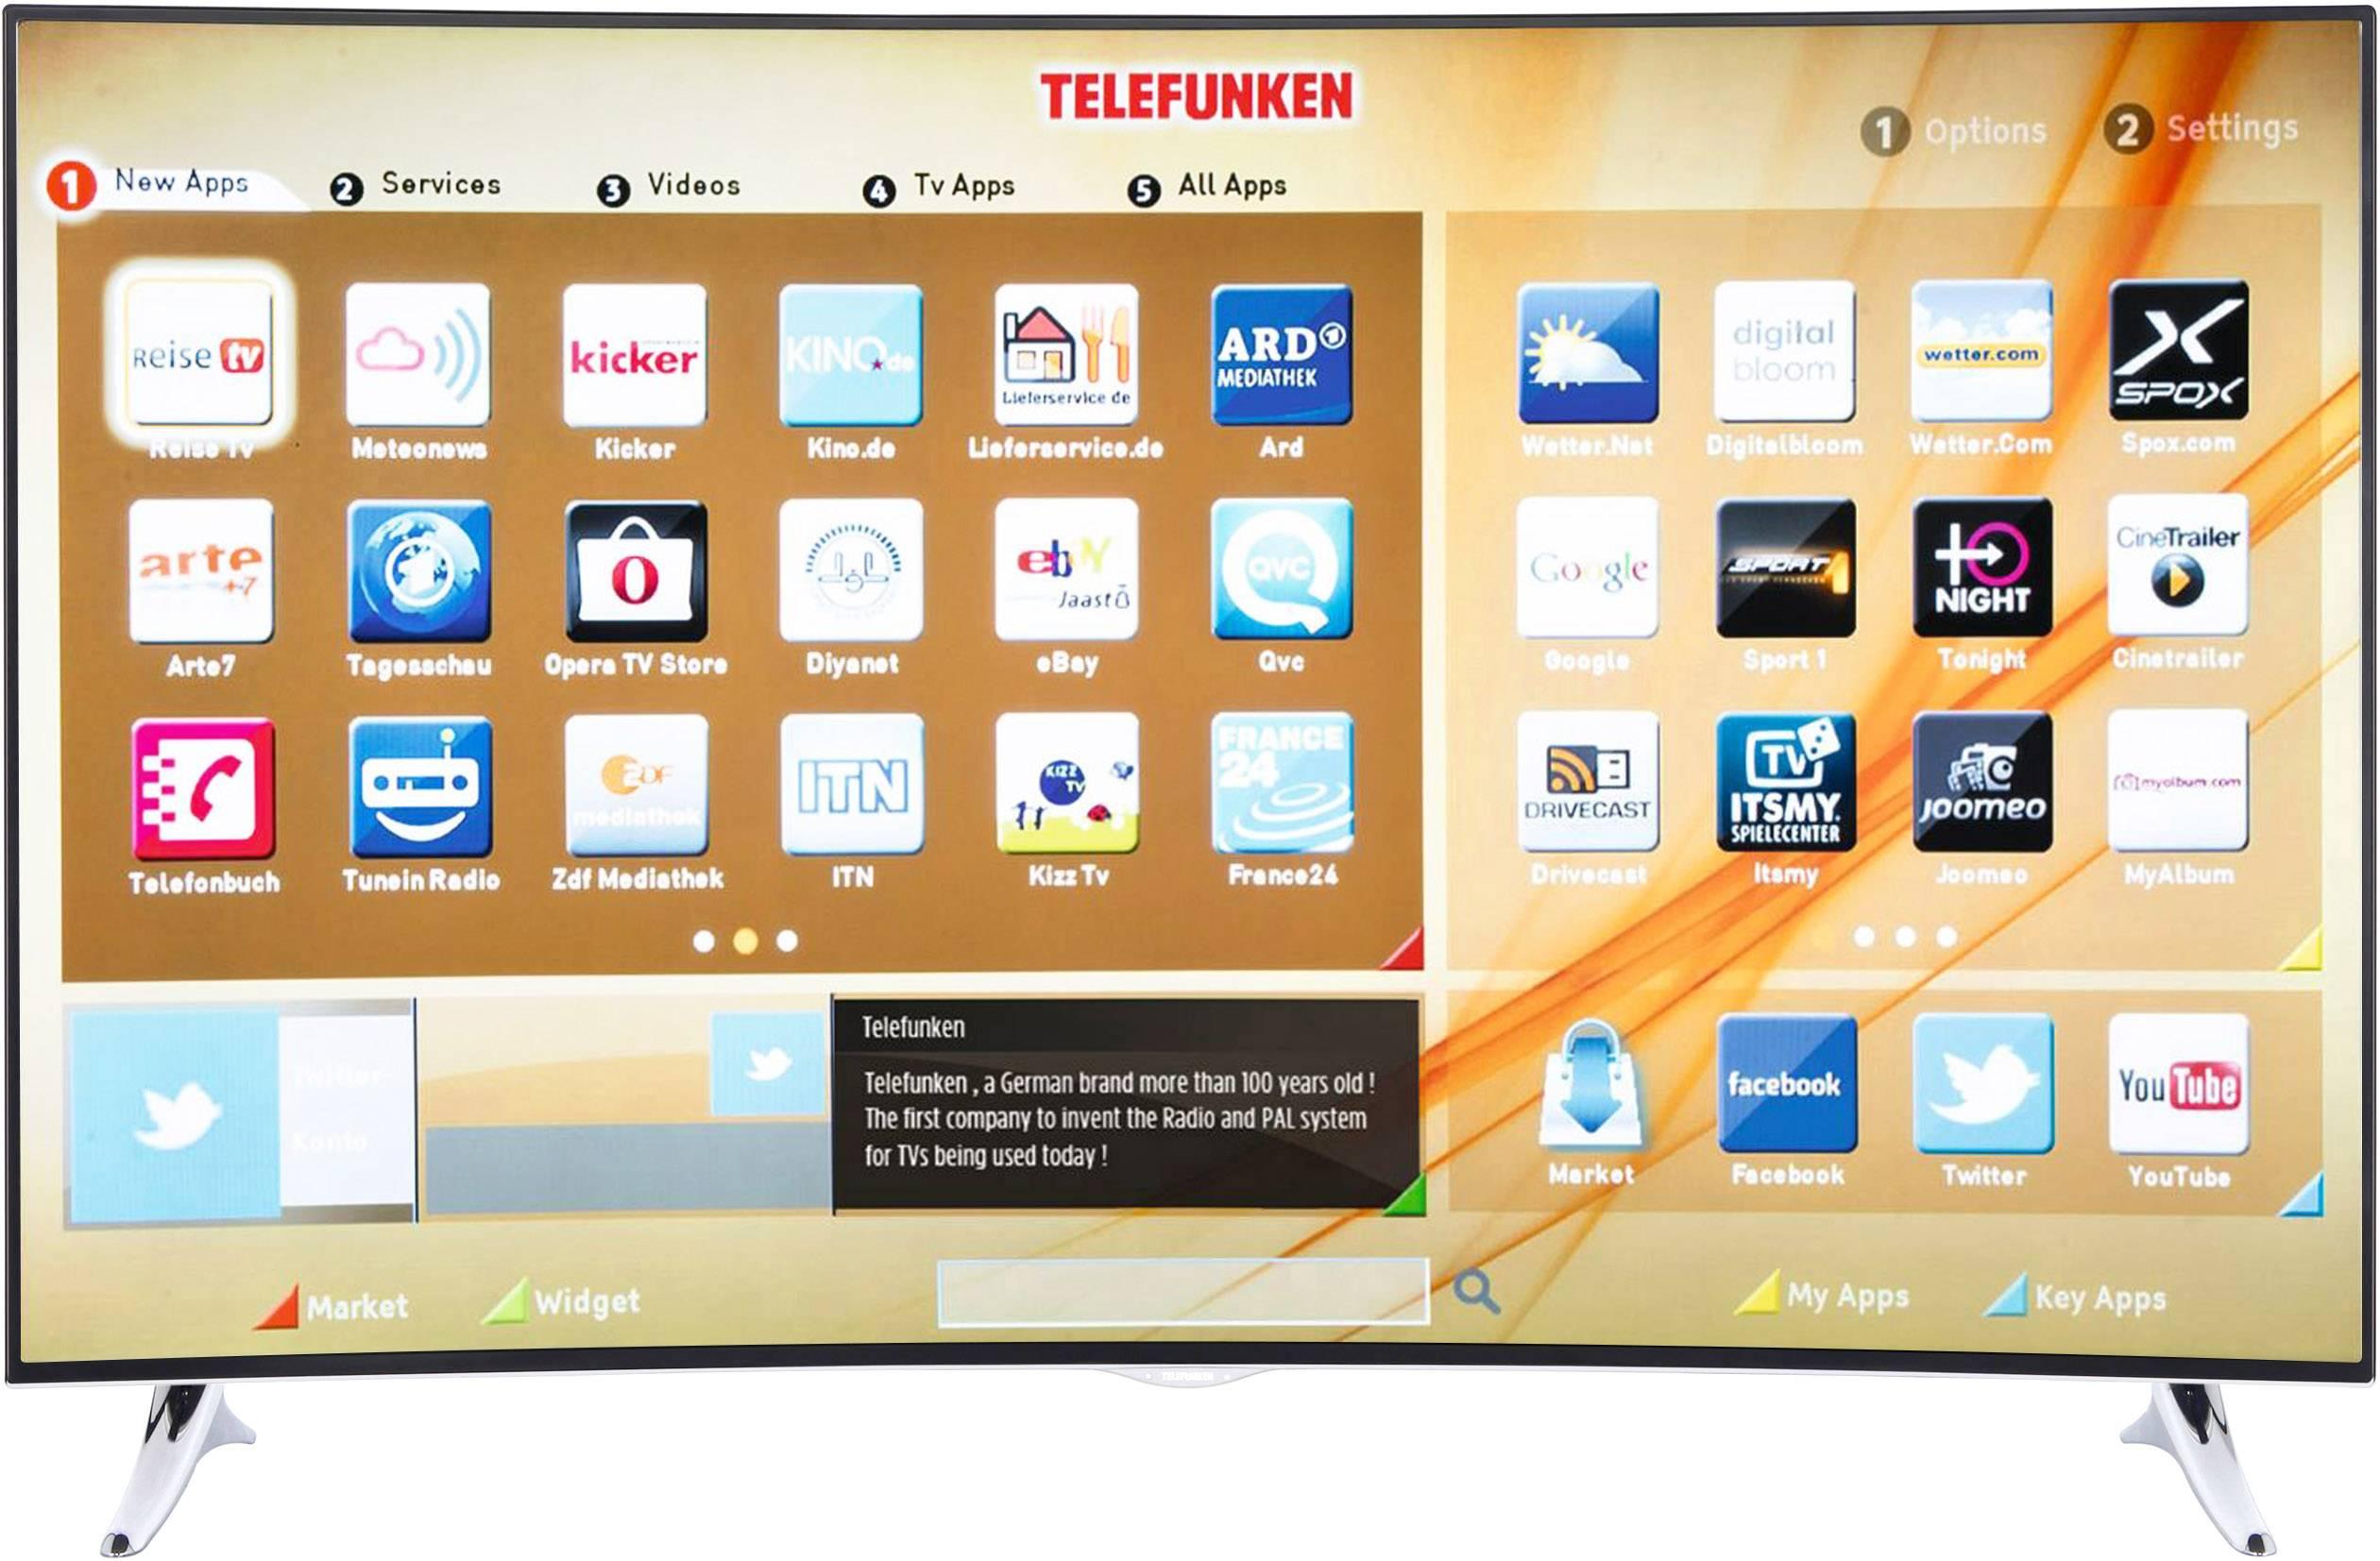 telefunken c55u320n4cw 3d led tv 140 cm 55 inch dvb t2 dvb c dvb s uhd curved 3d smart tv wi fi ci black